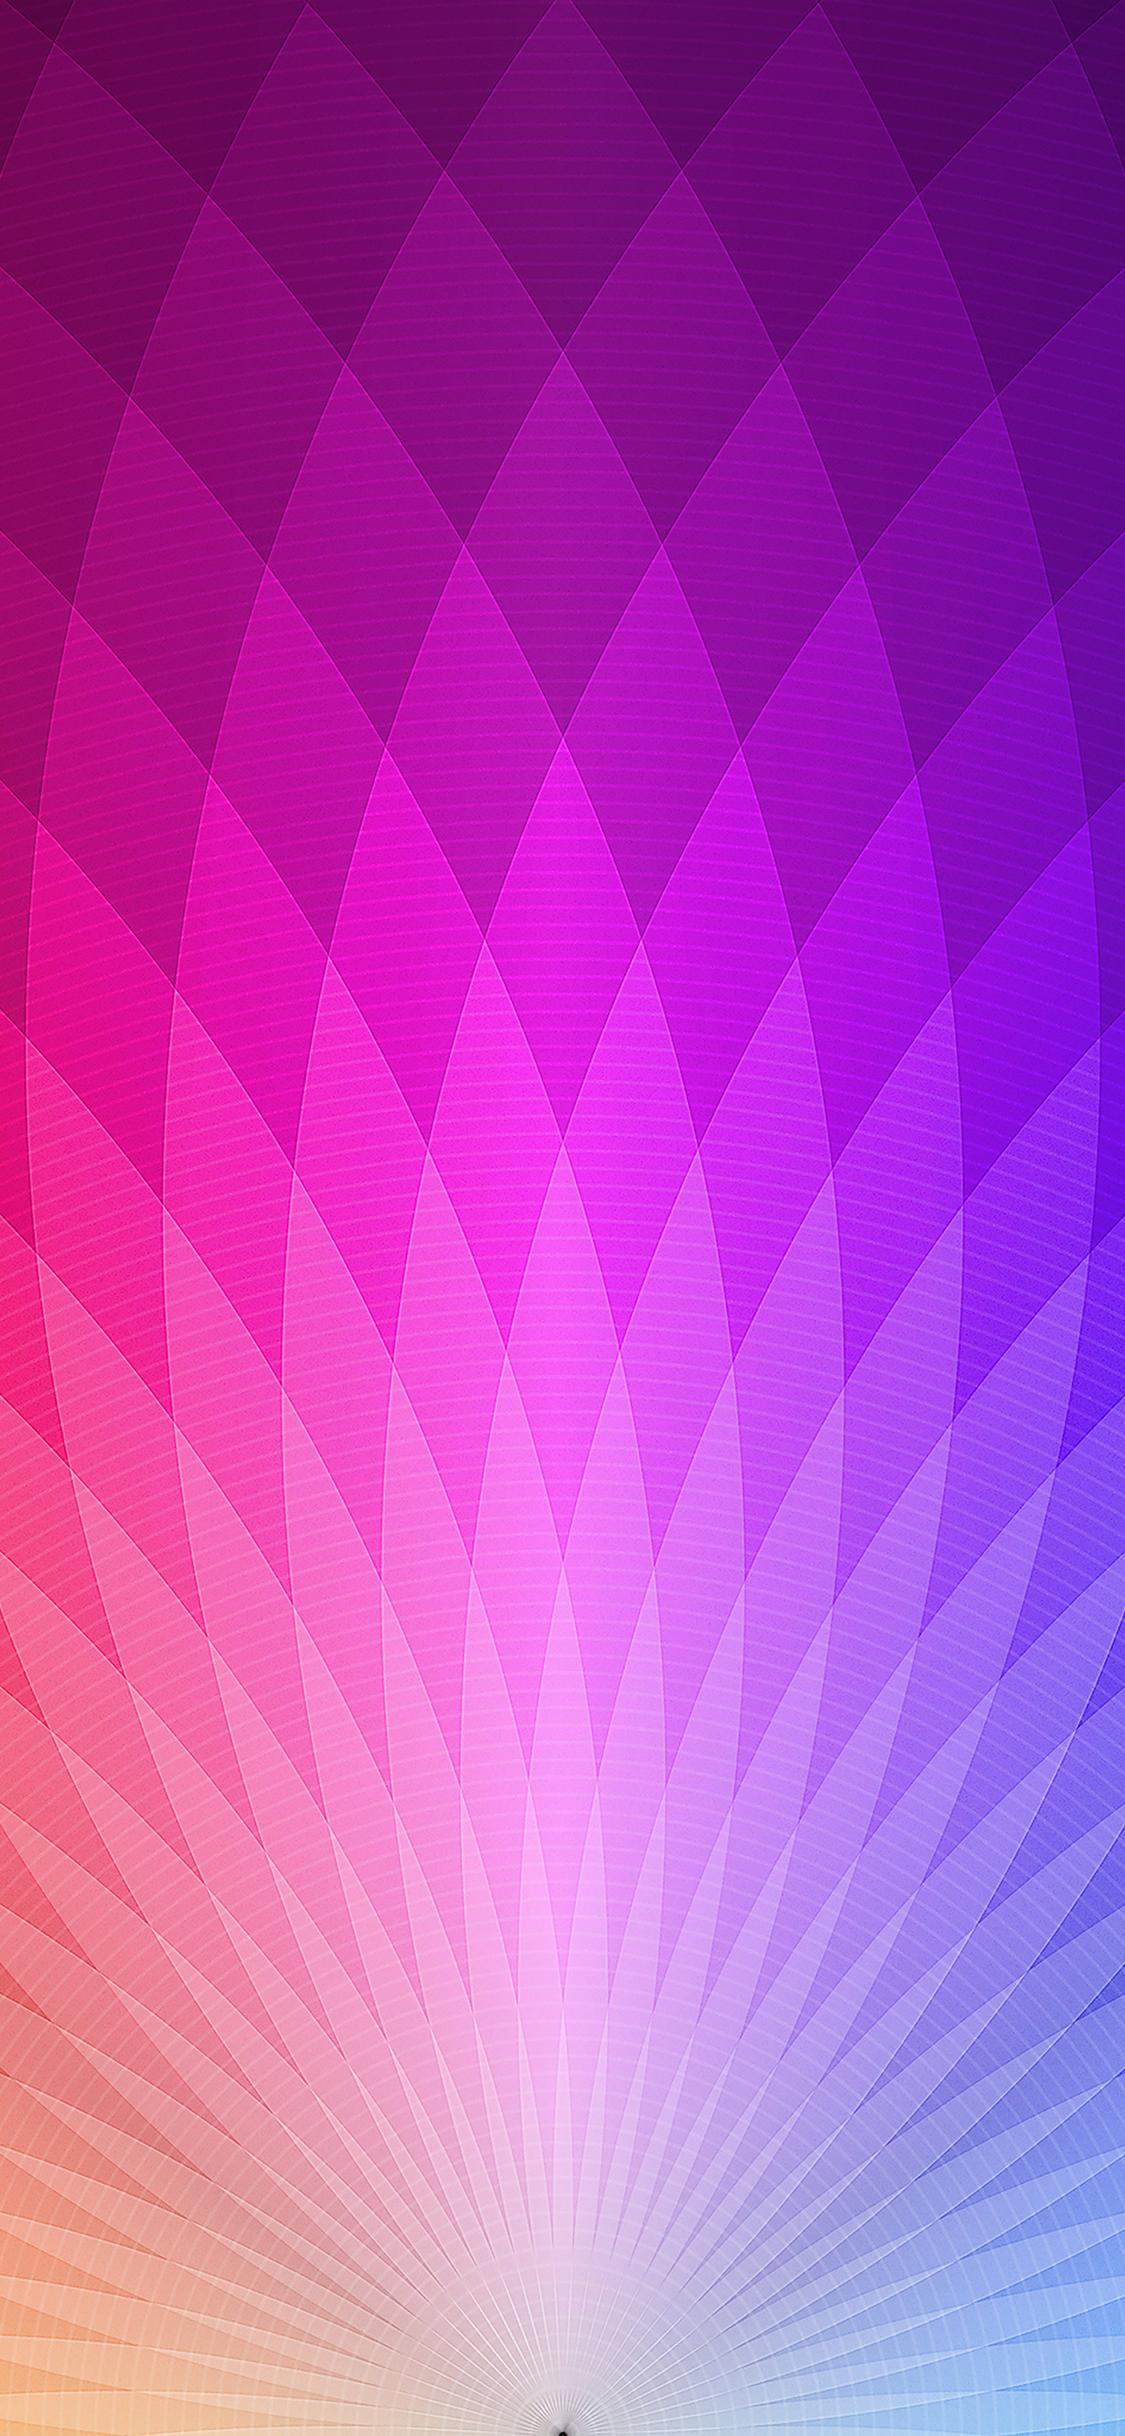 iPhoneXpapers.com-Apple-iPhone-wallpaper-vb90-wallpaper-rainbow-patterns-art